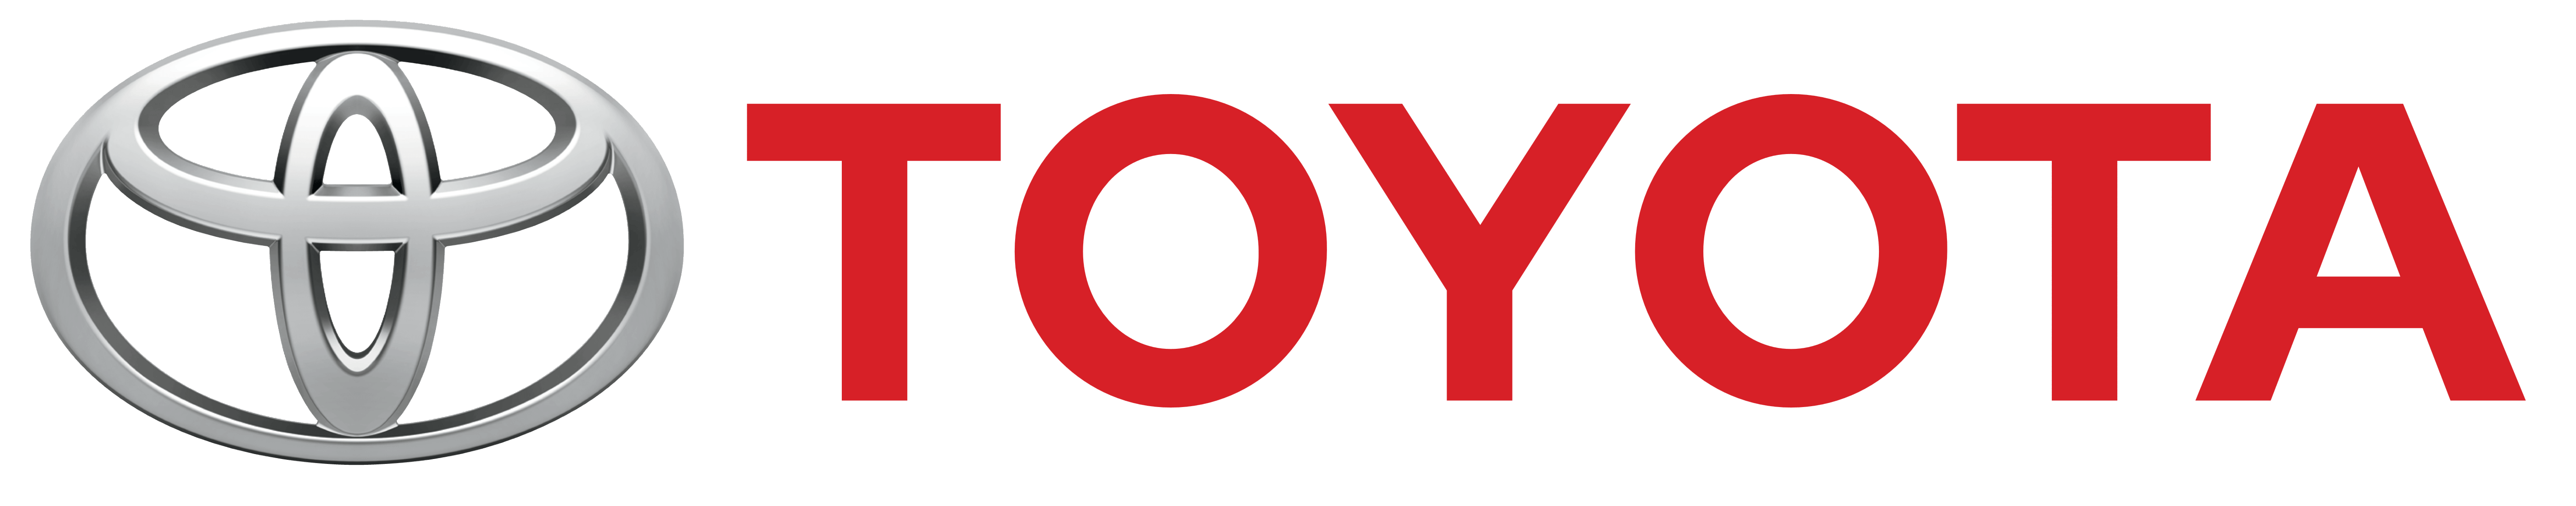 qVZnGK-toyota-logo-free-min